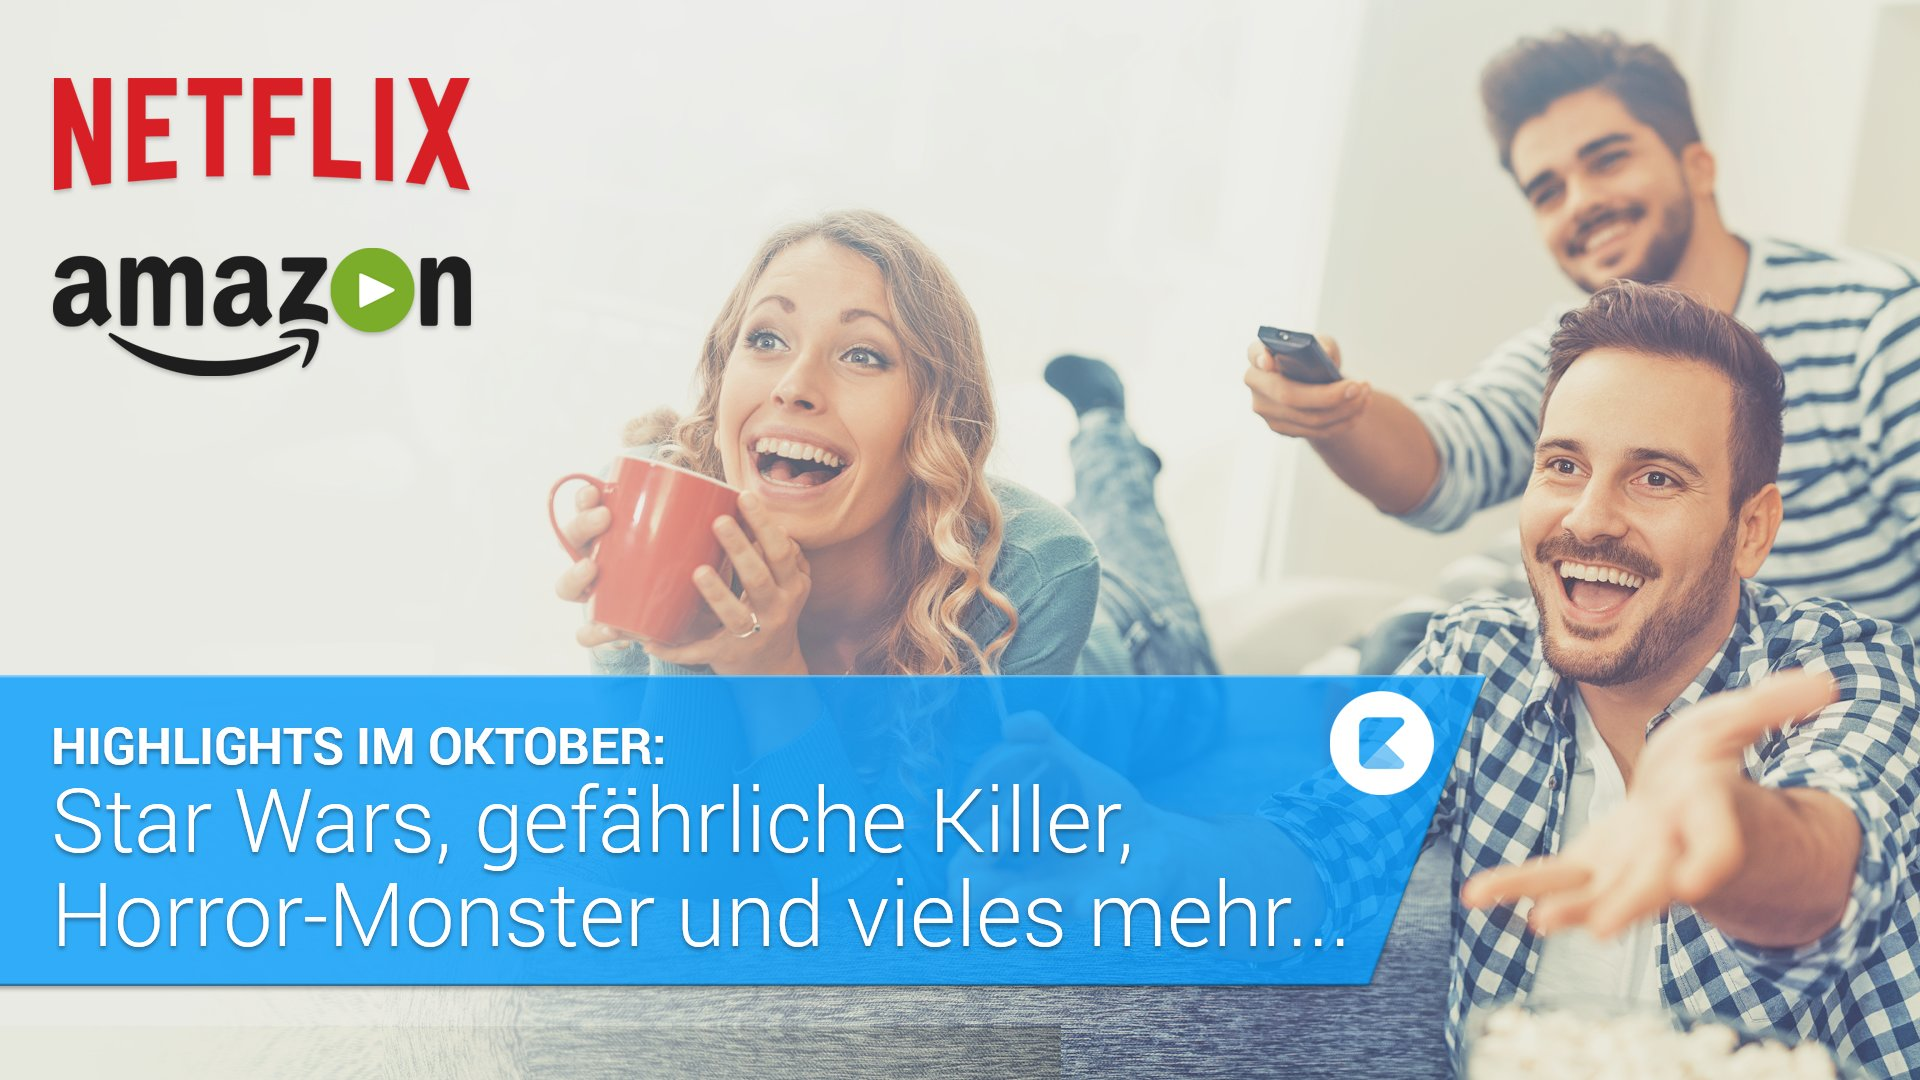 John Wick 2 Auf Dvd Blu Ray Infos Zum Start Den Extras Kinode